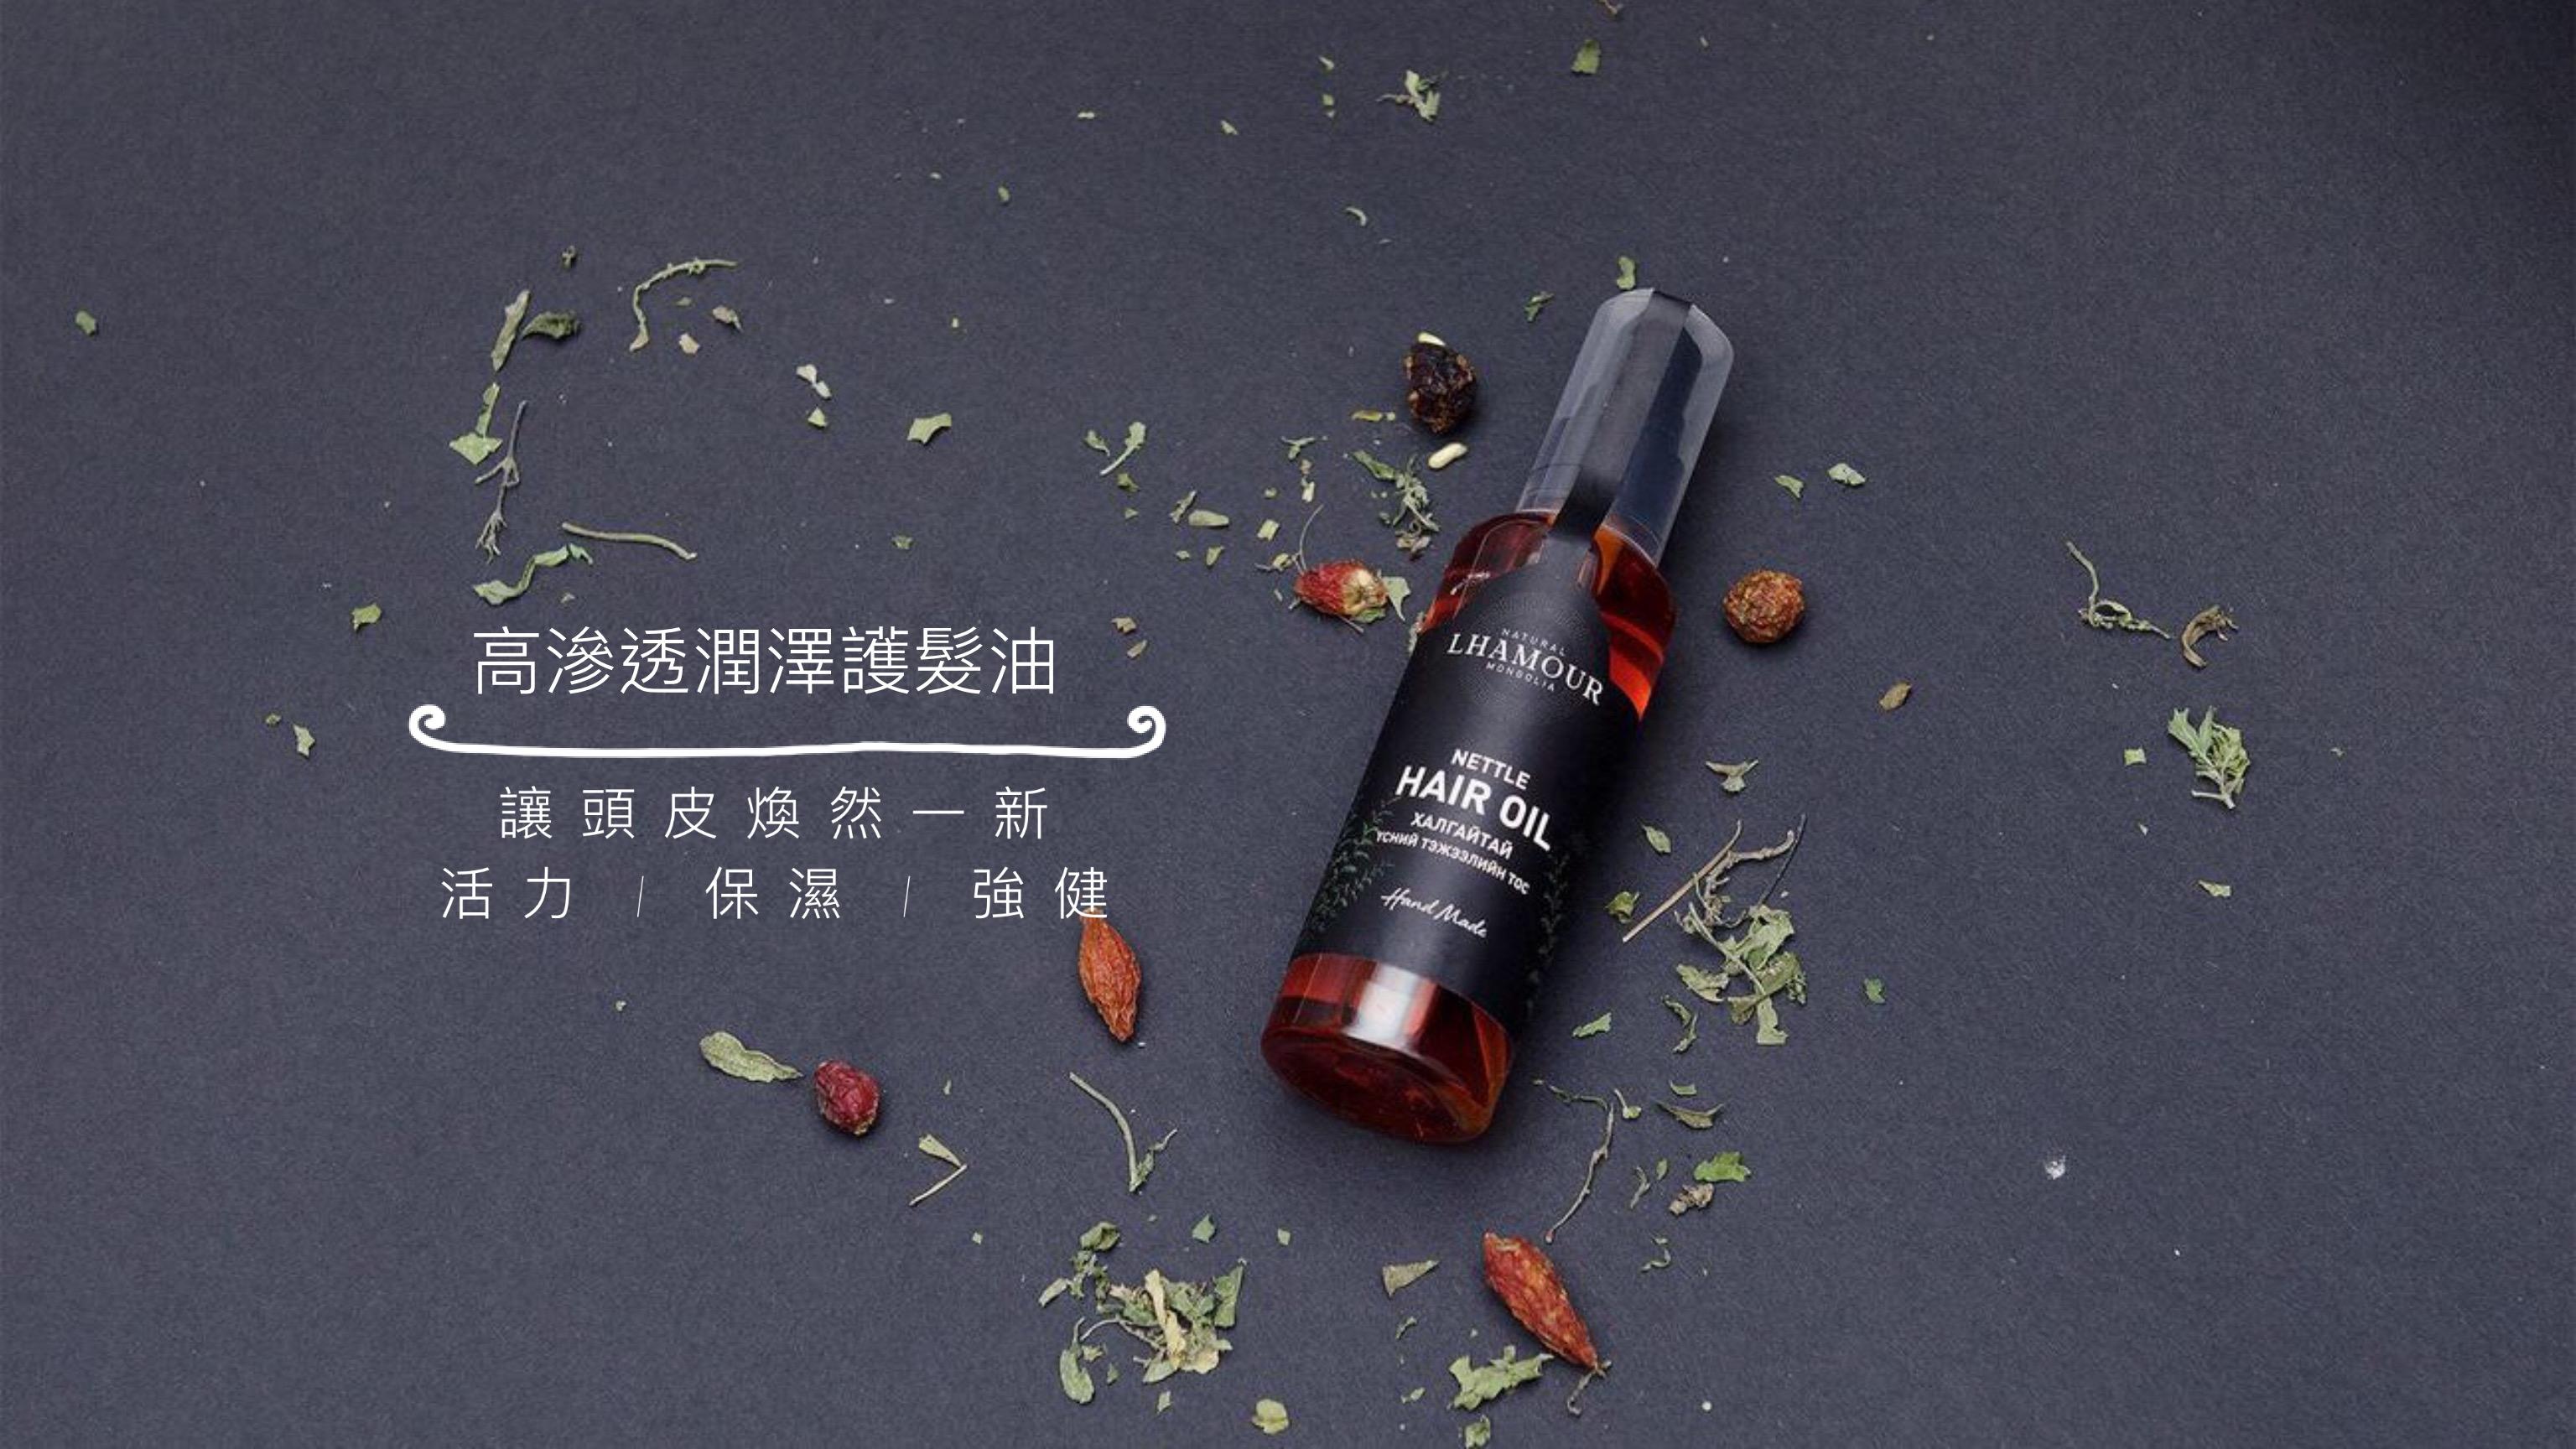 Lhamour高滲透潤澤護髮油